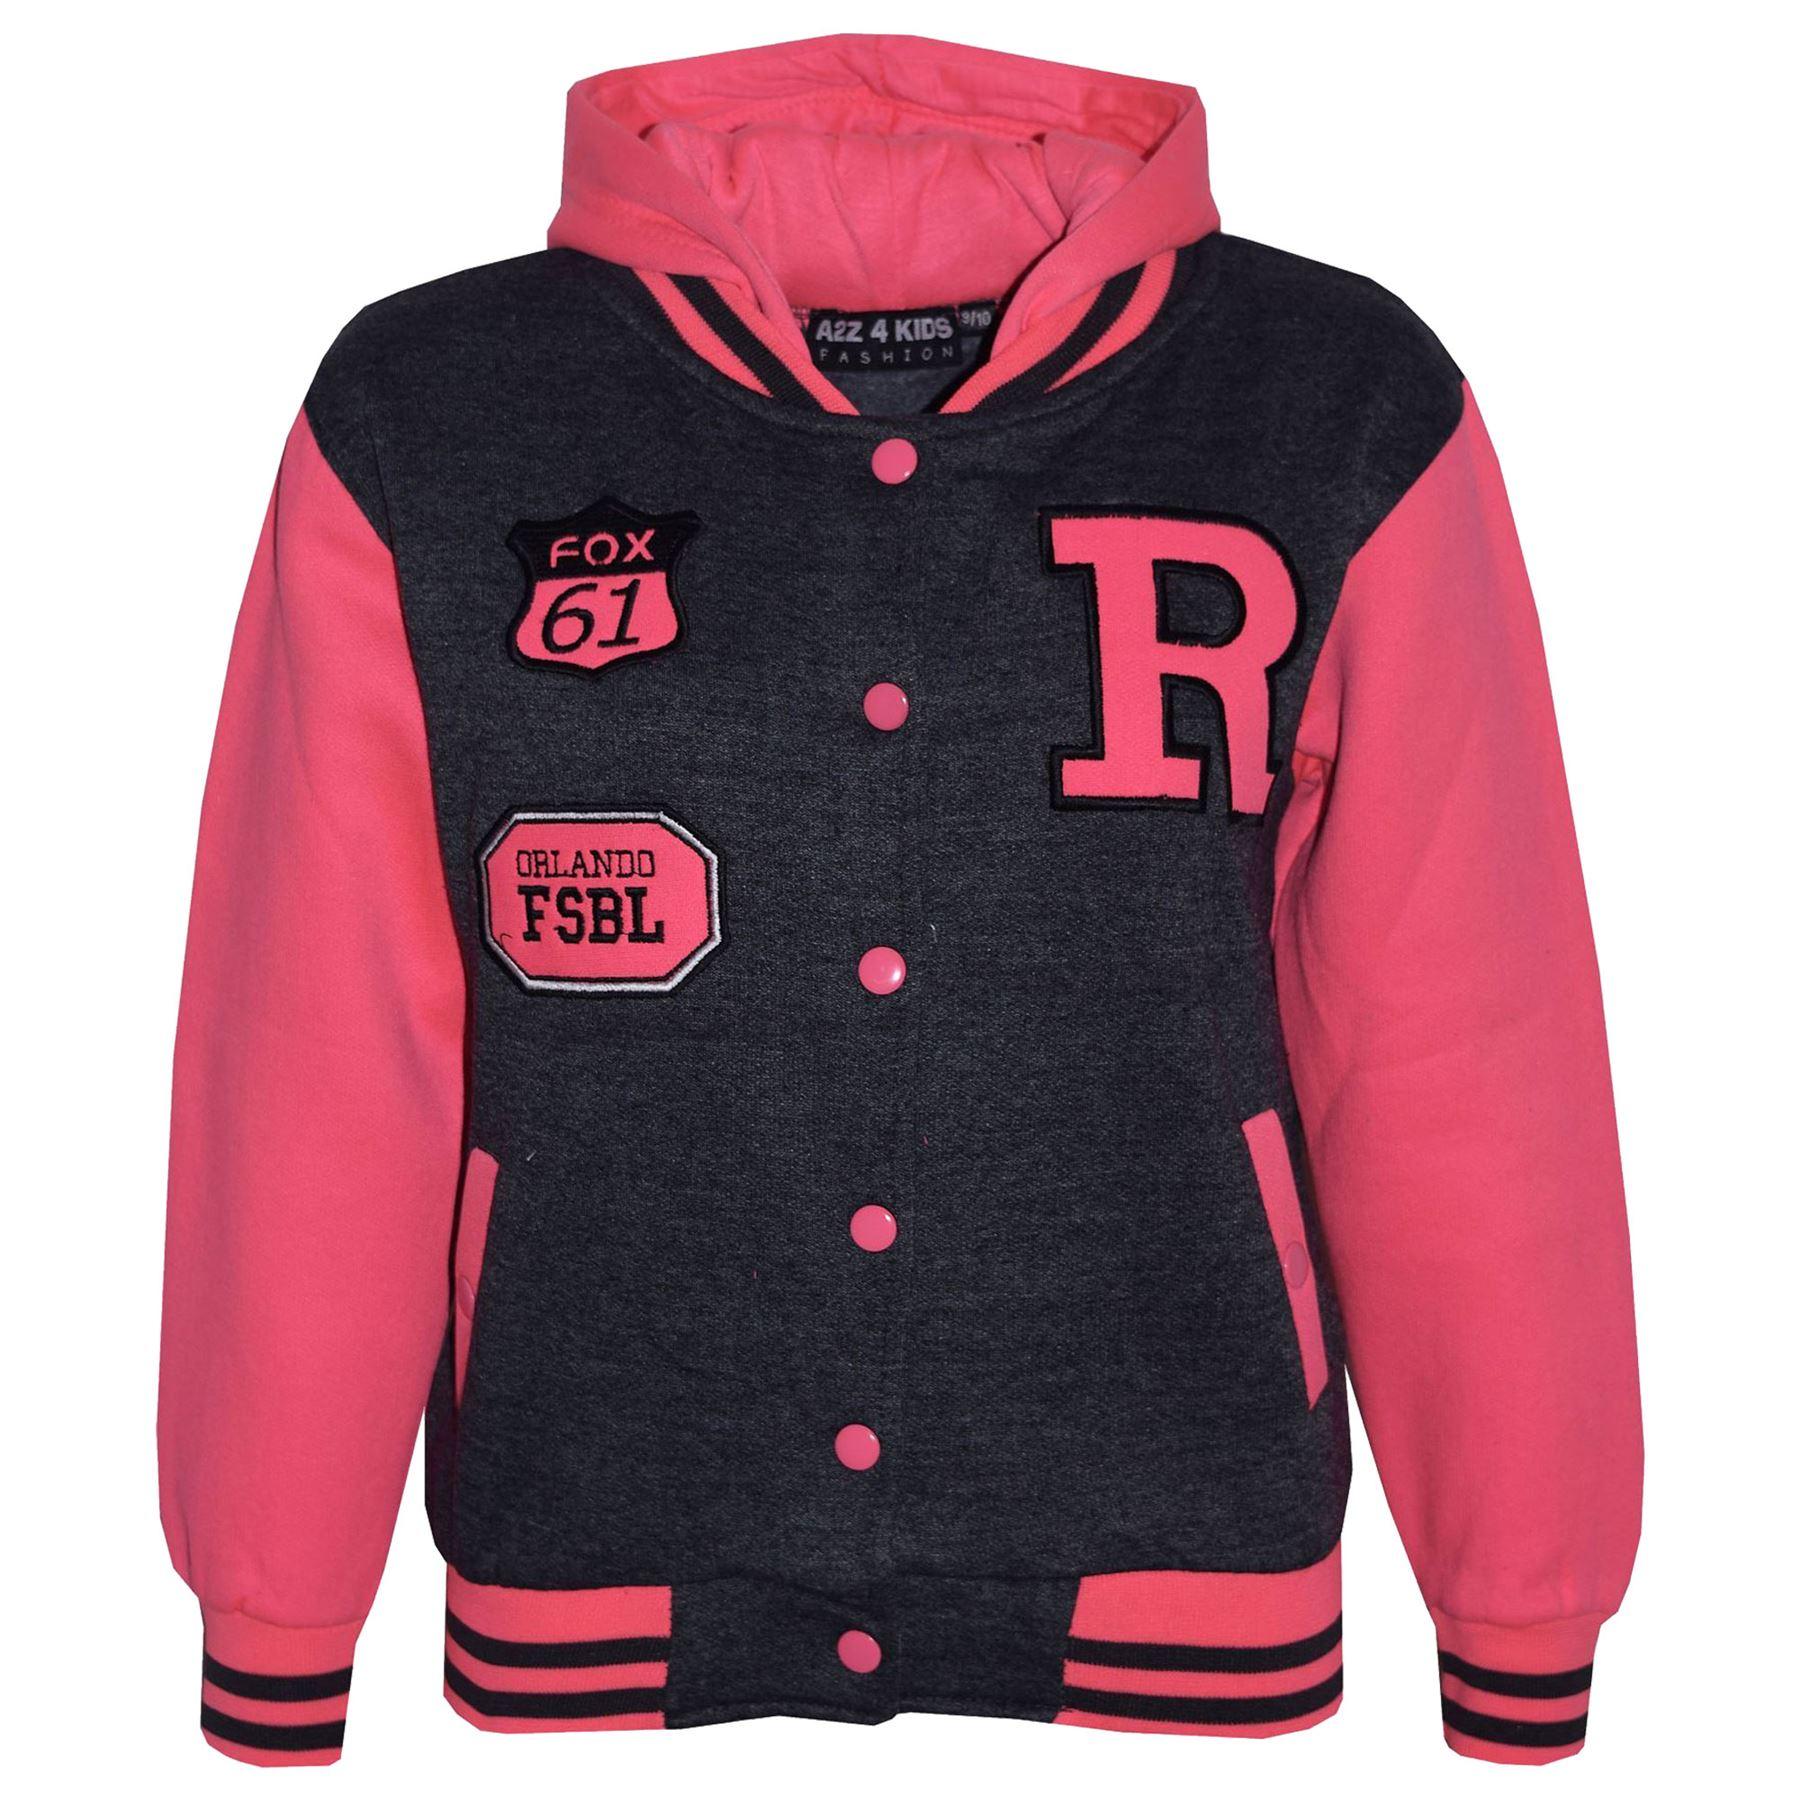 Enfants-Filles-Garcons-R-Mode-Nyc-Renard-Baseball-Veste-Capuche-Universitaire